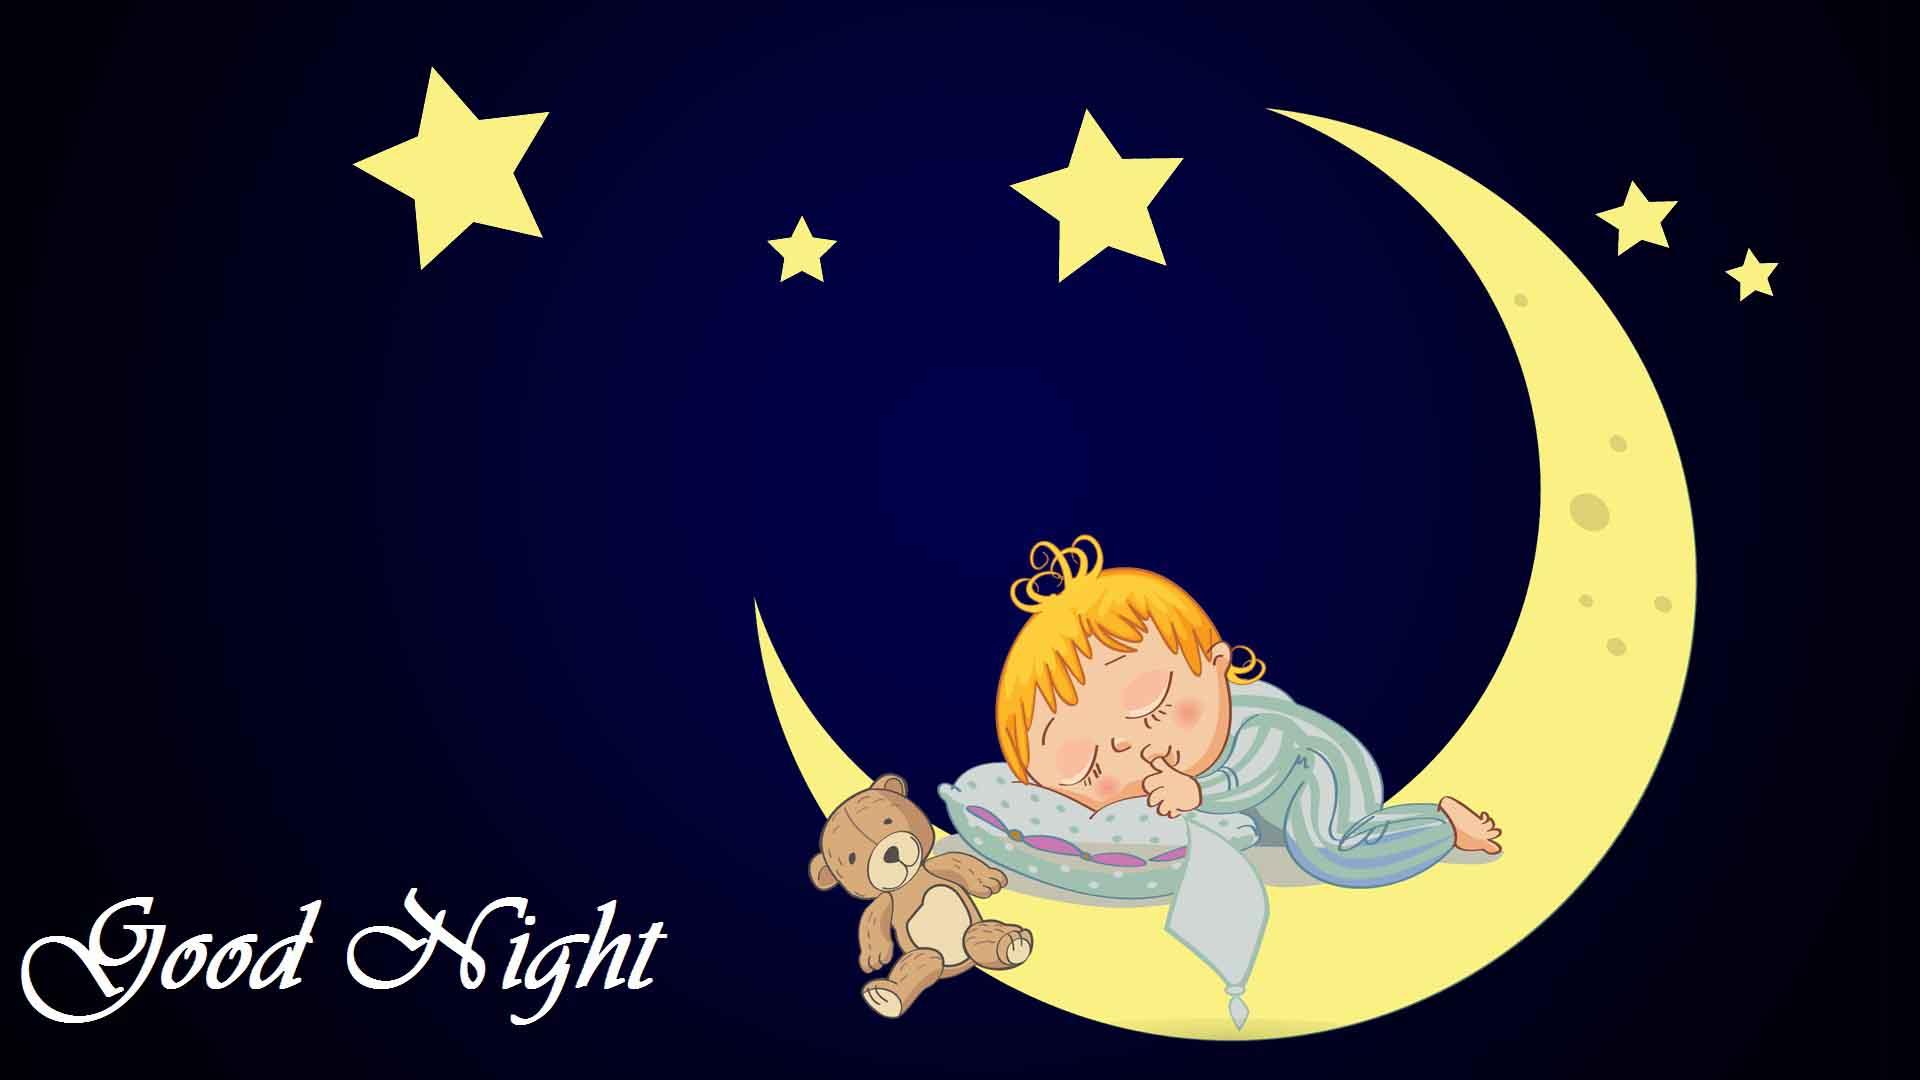 Ảnh good night boy